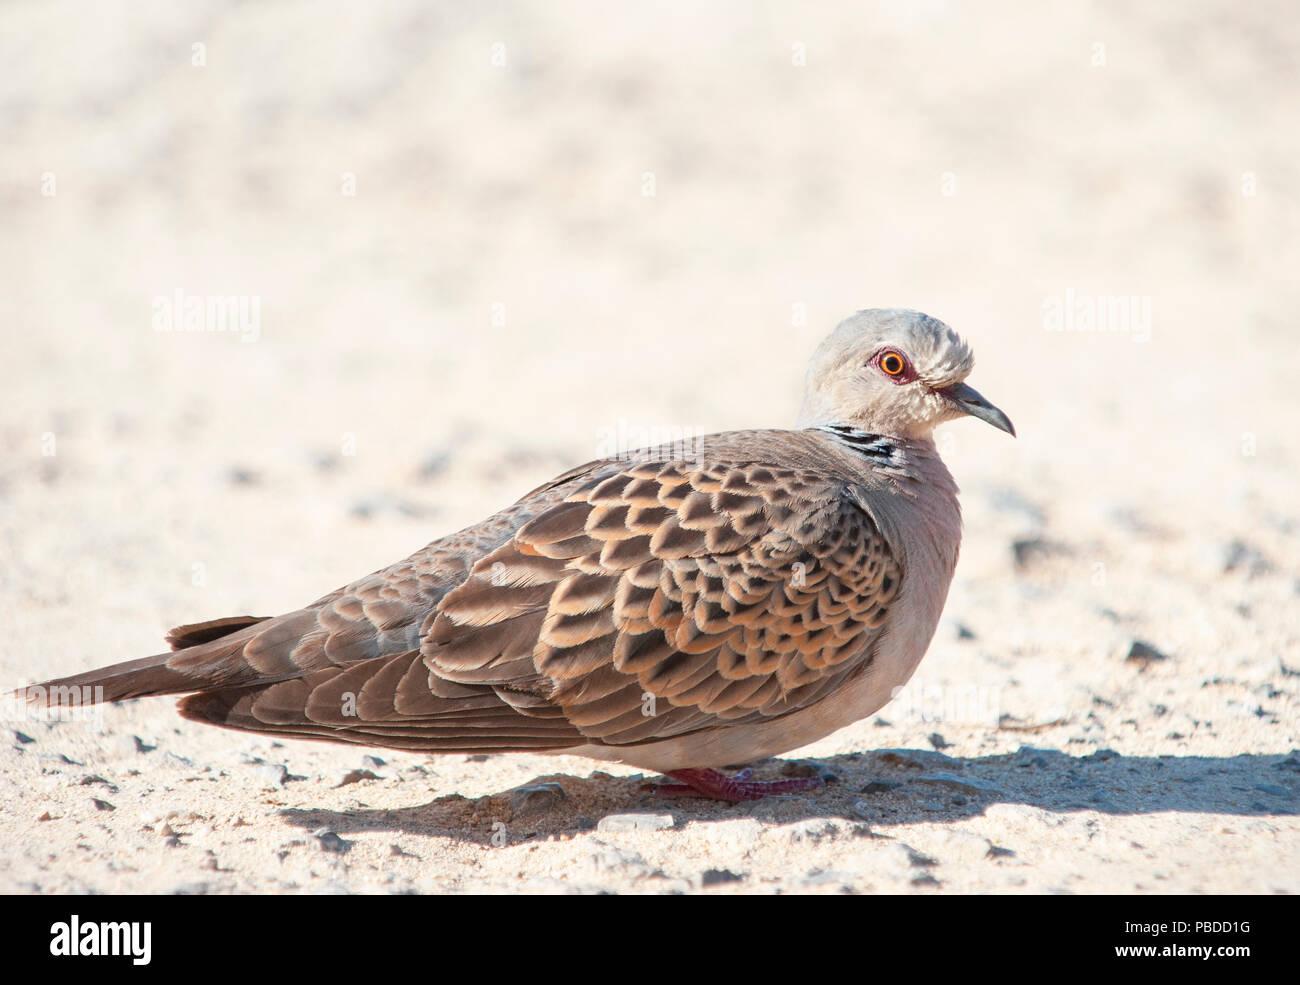 adult European Turtle Dove,(Streptopelia turtur), Ibiza, Balearic Islands, Mediterranean Sea, Spain Stock Photo